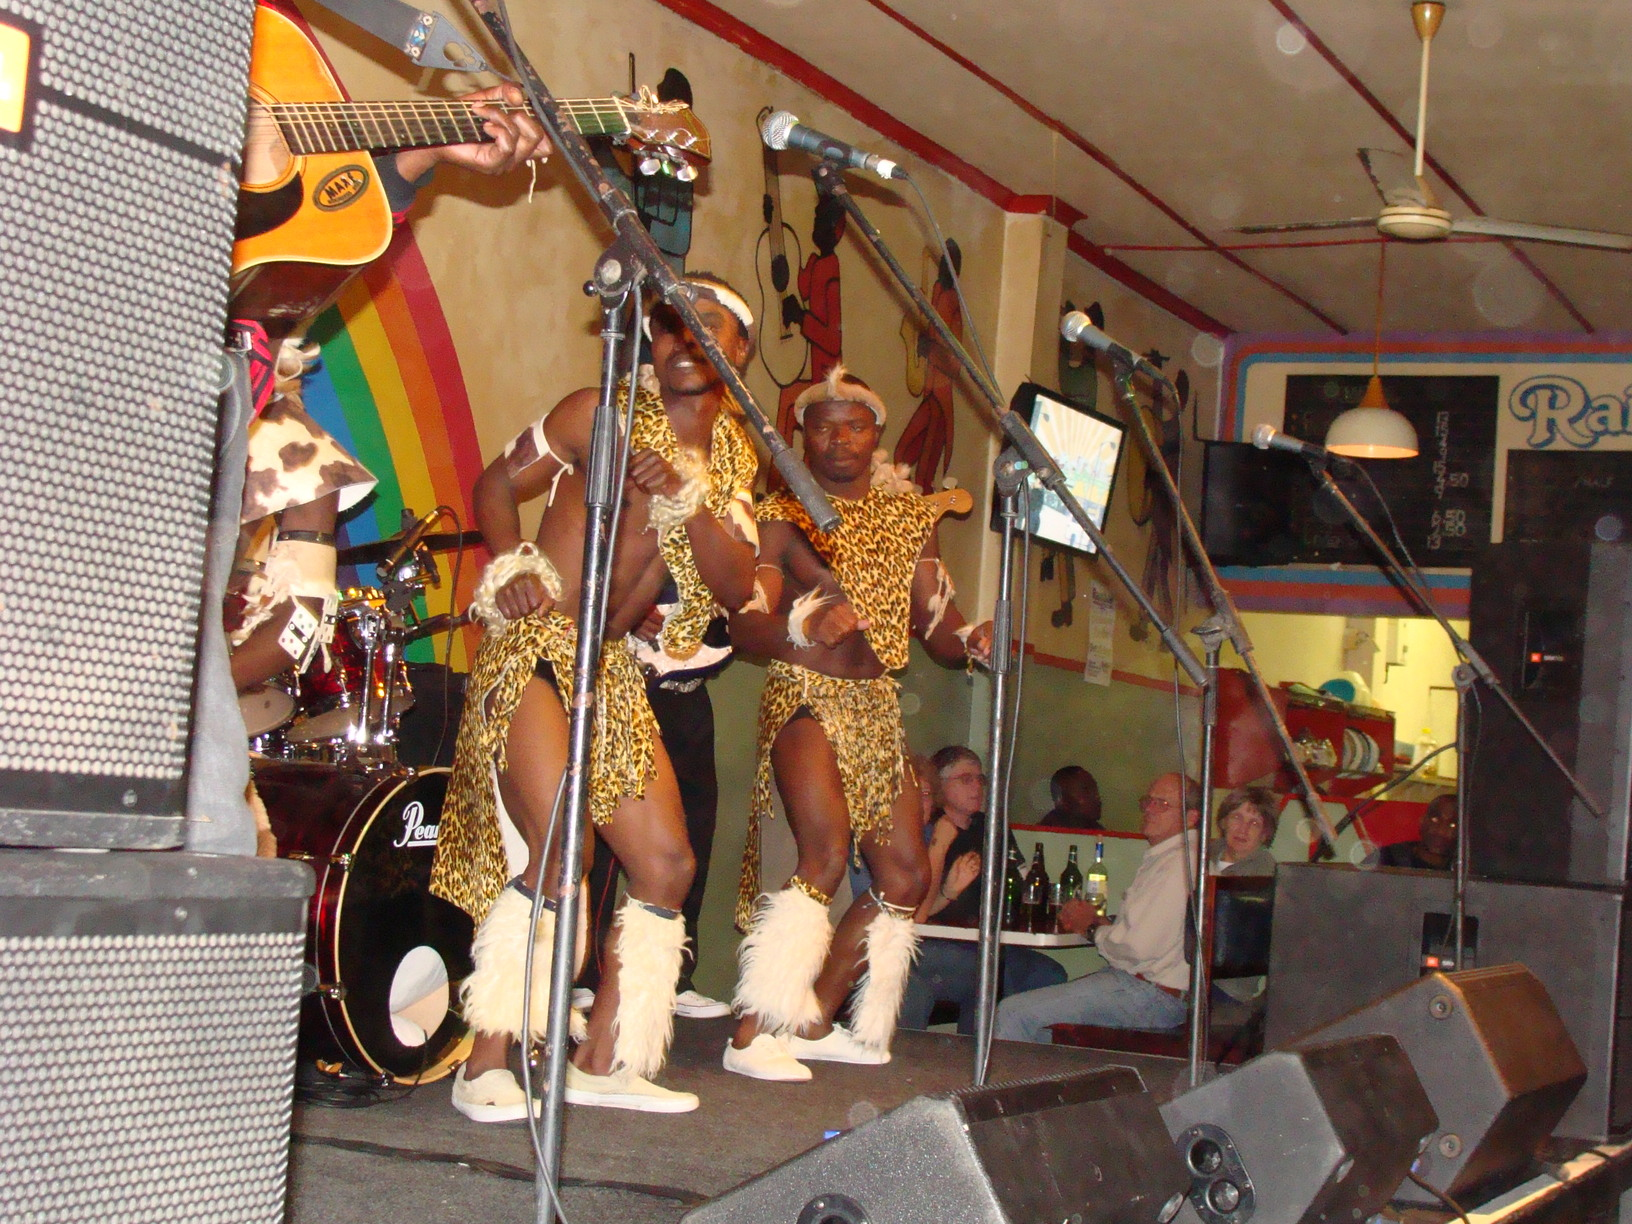 Annual Sangoma ceremony in Zululand /static/Zulu/shabalala.jpg